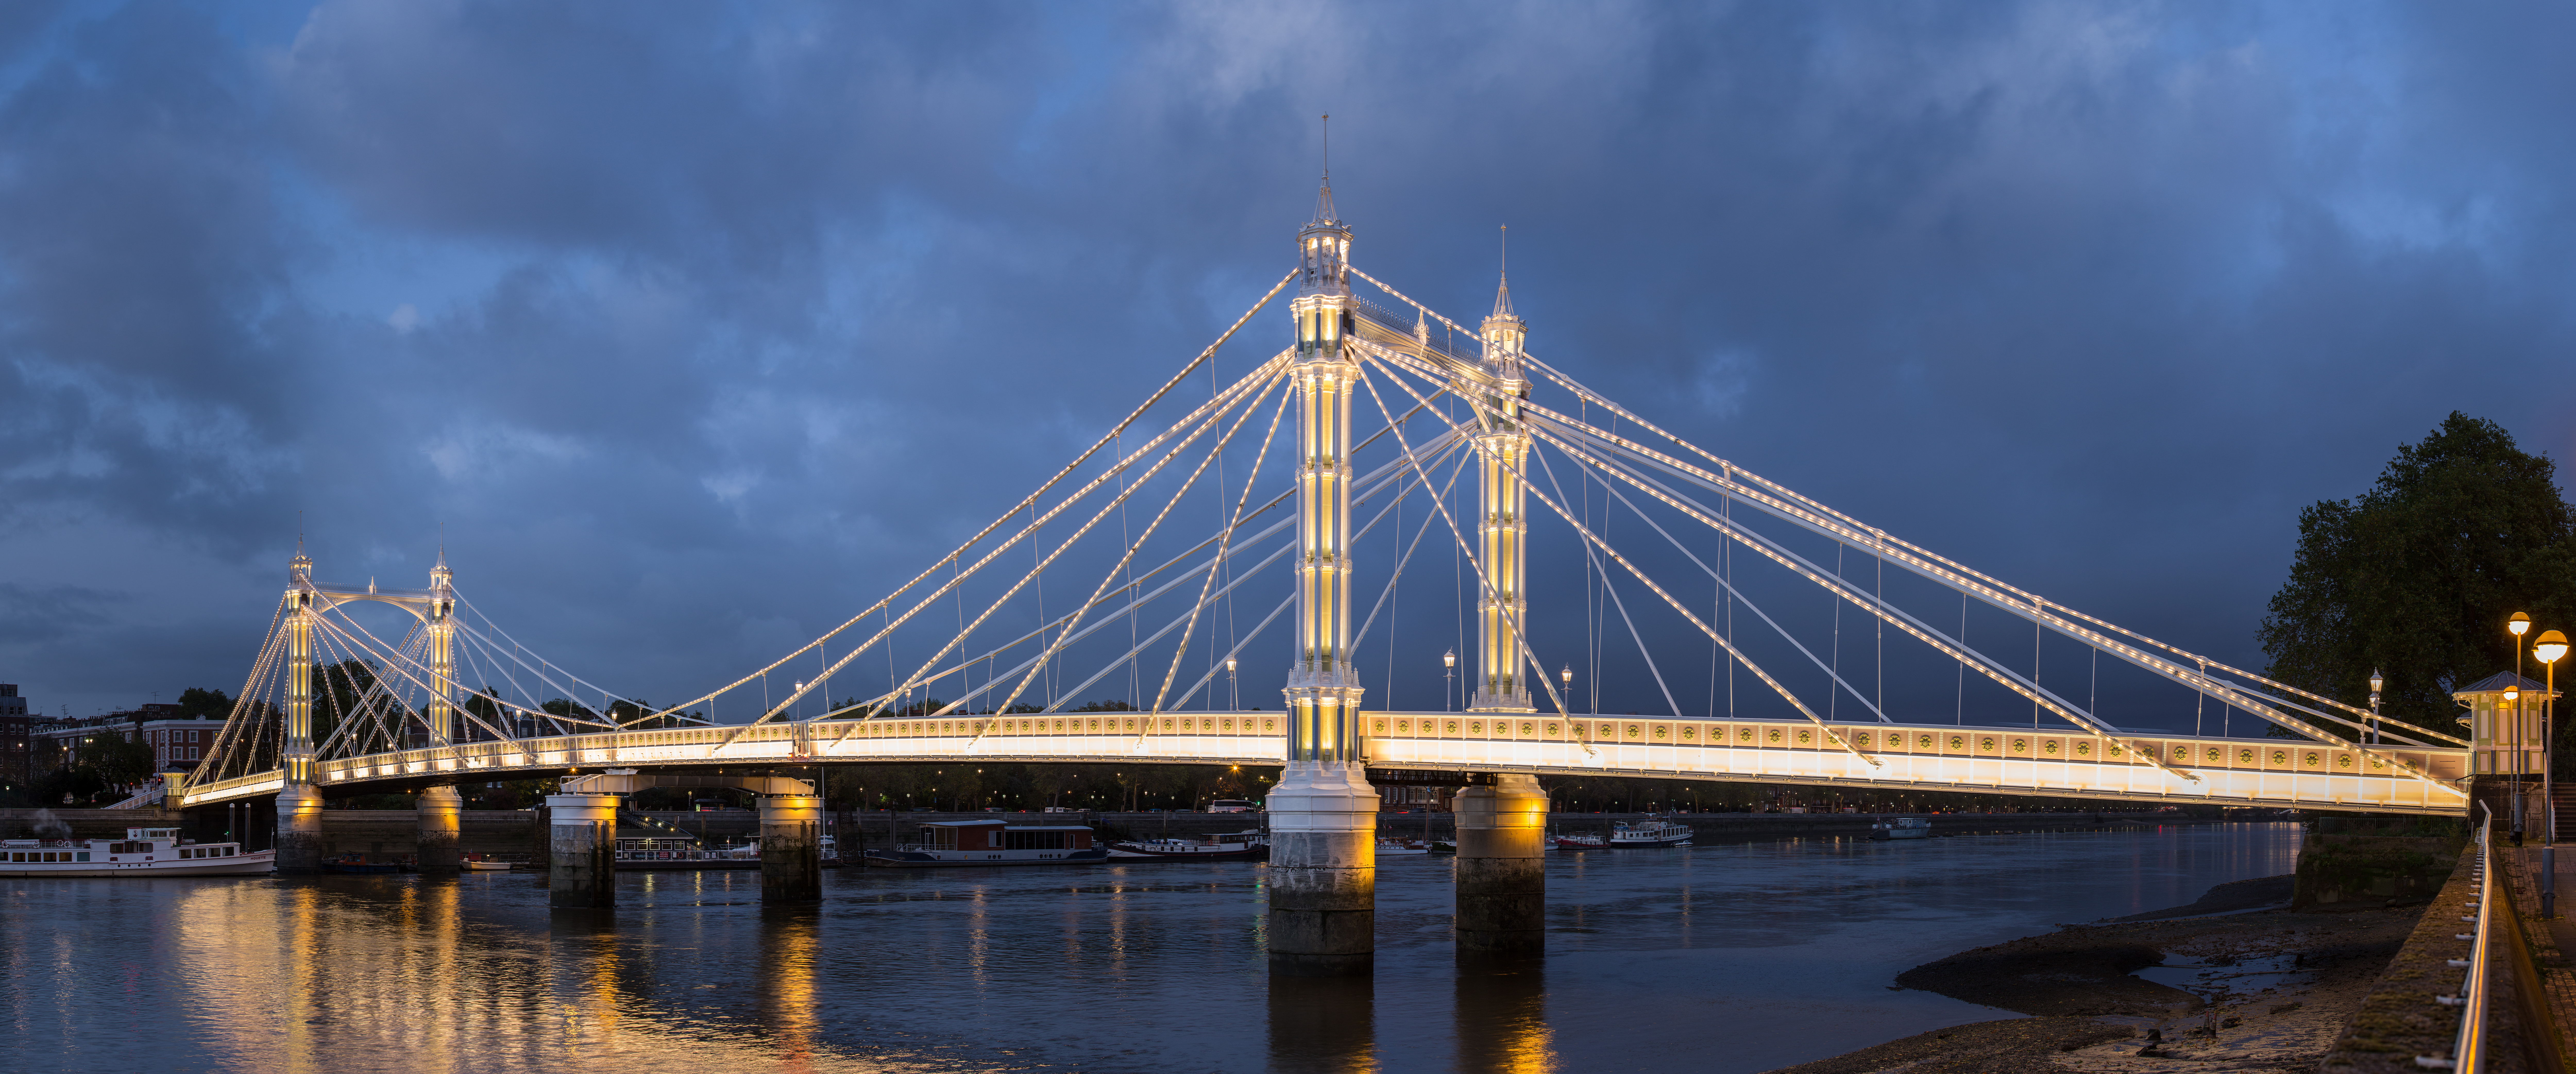 Albert_Bridge,_London_-_Oct_2012